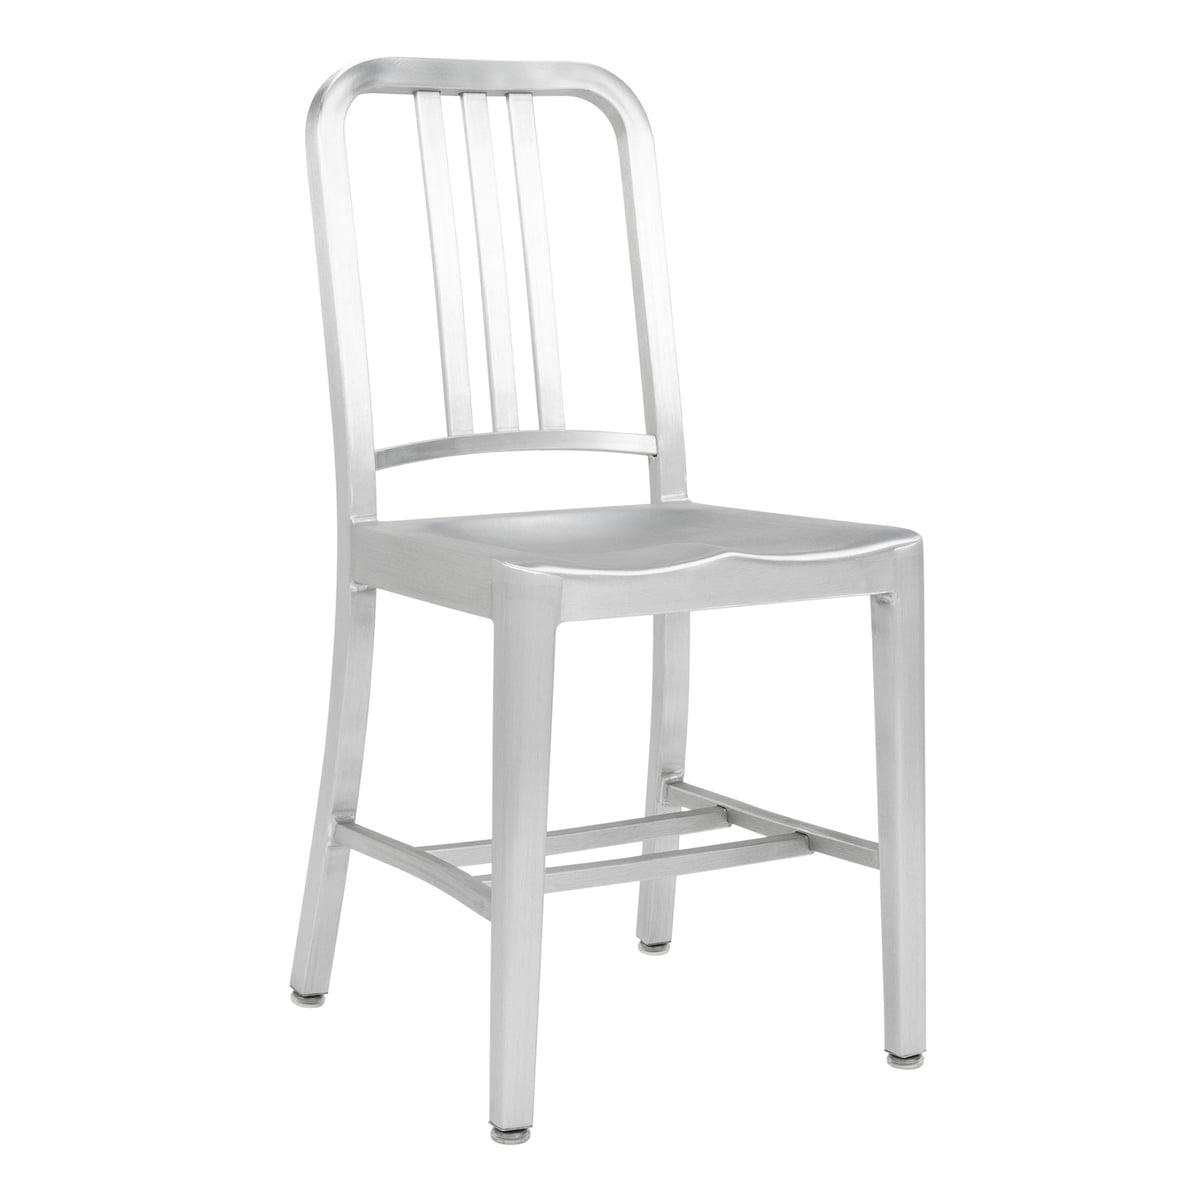 emeco - navy chair   emeco   shop